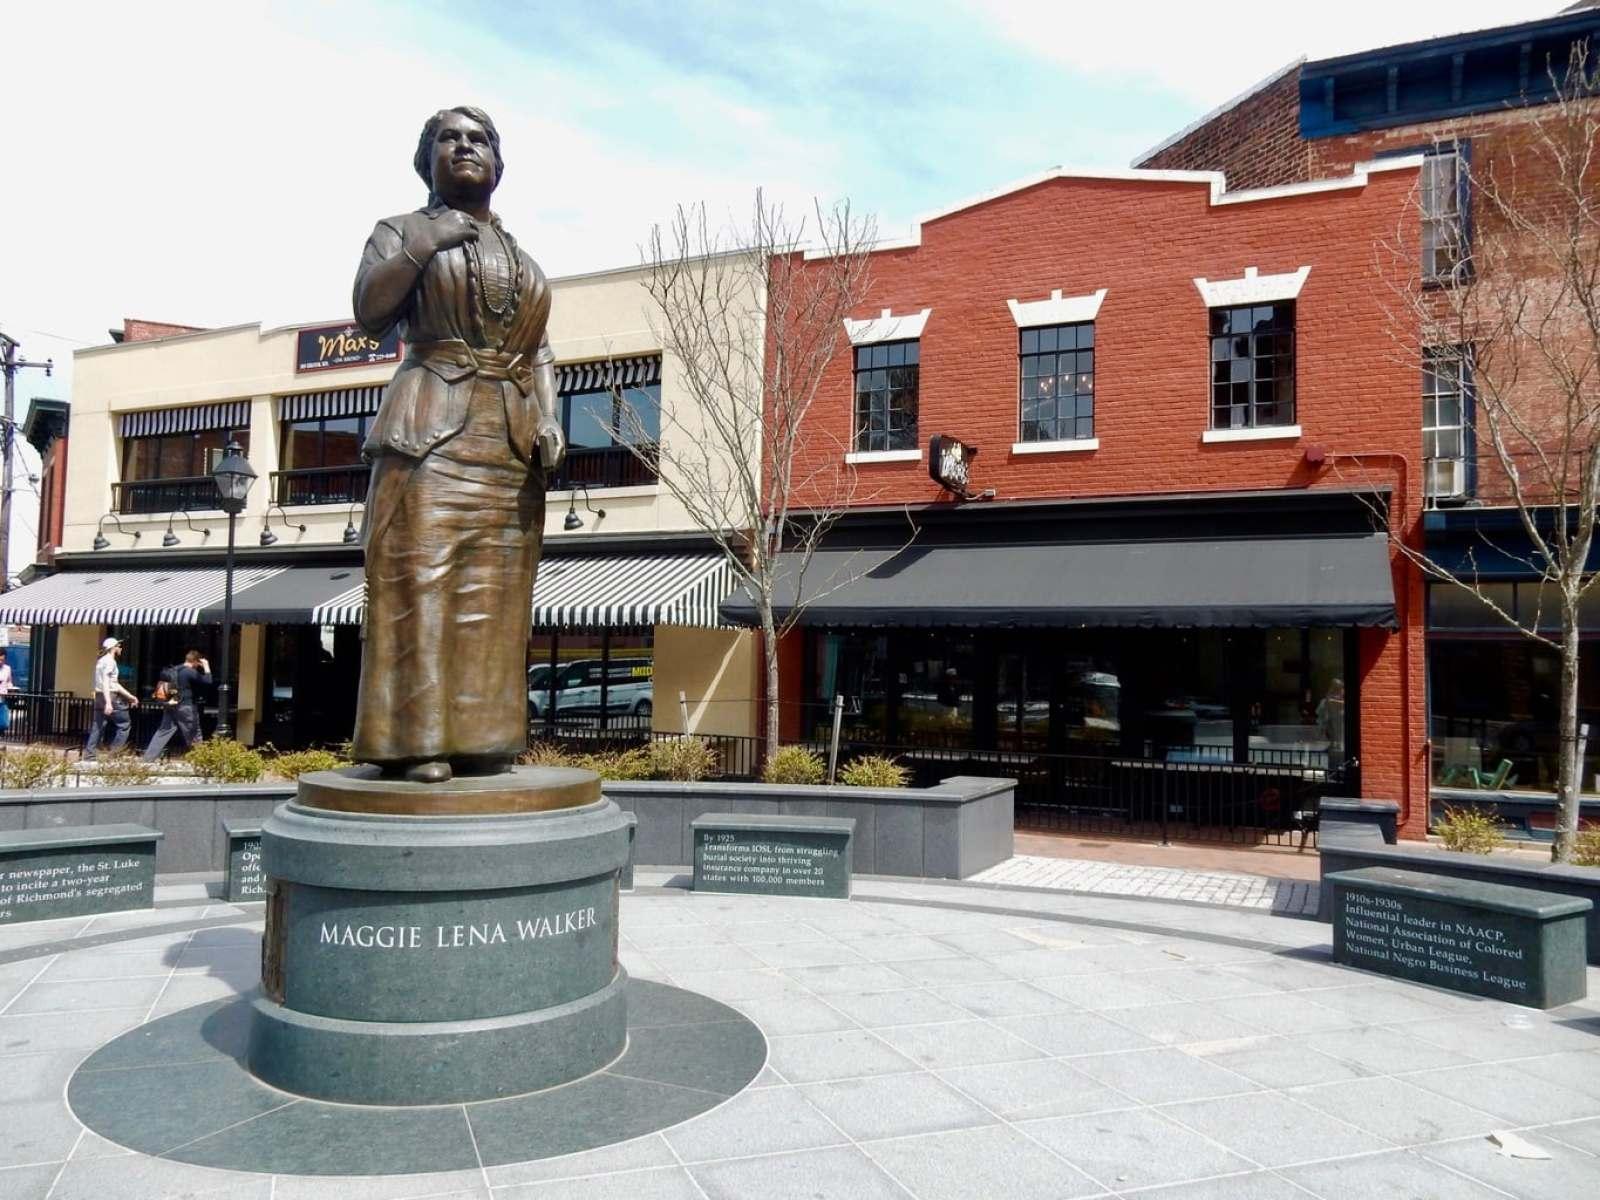 Statue of Maggie Lena Walker Richmond VA